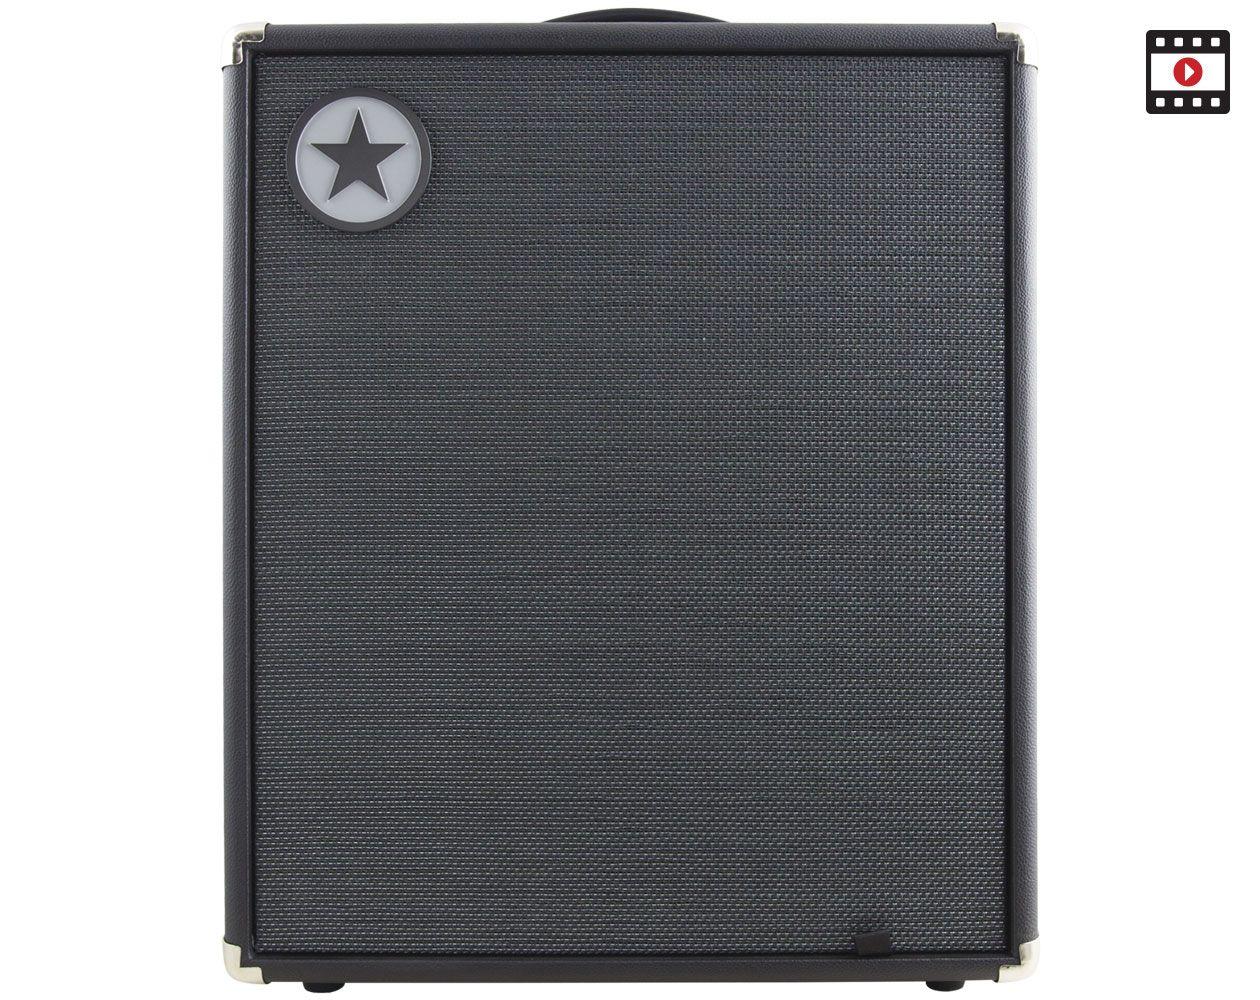 Blackstar Unity 500 Review